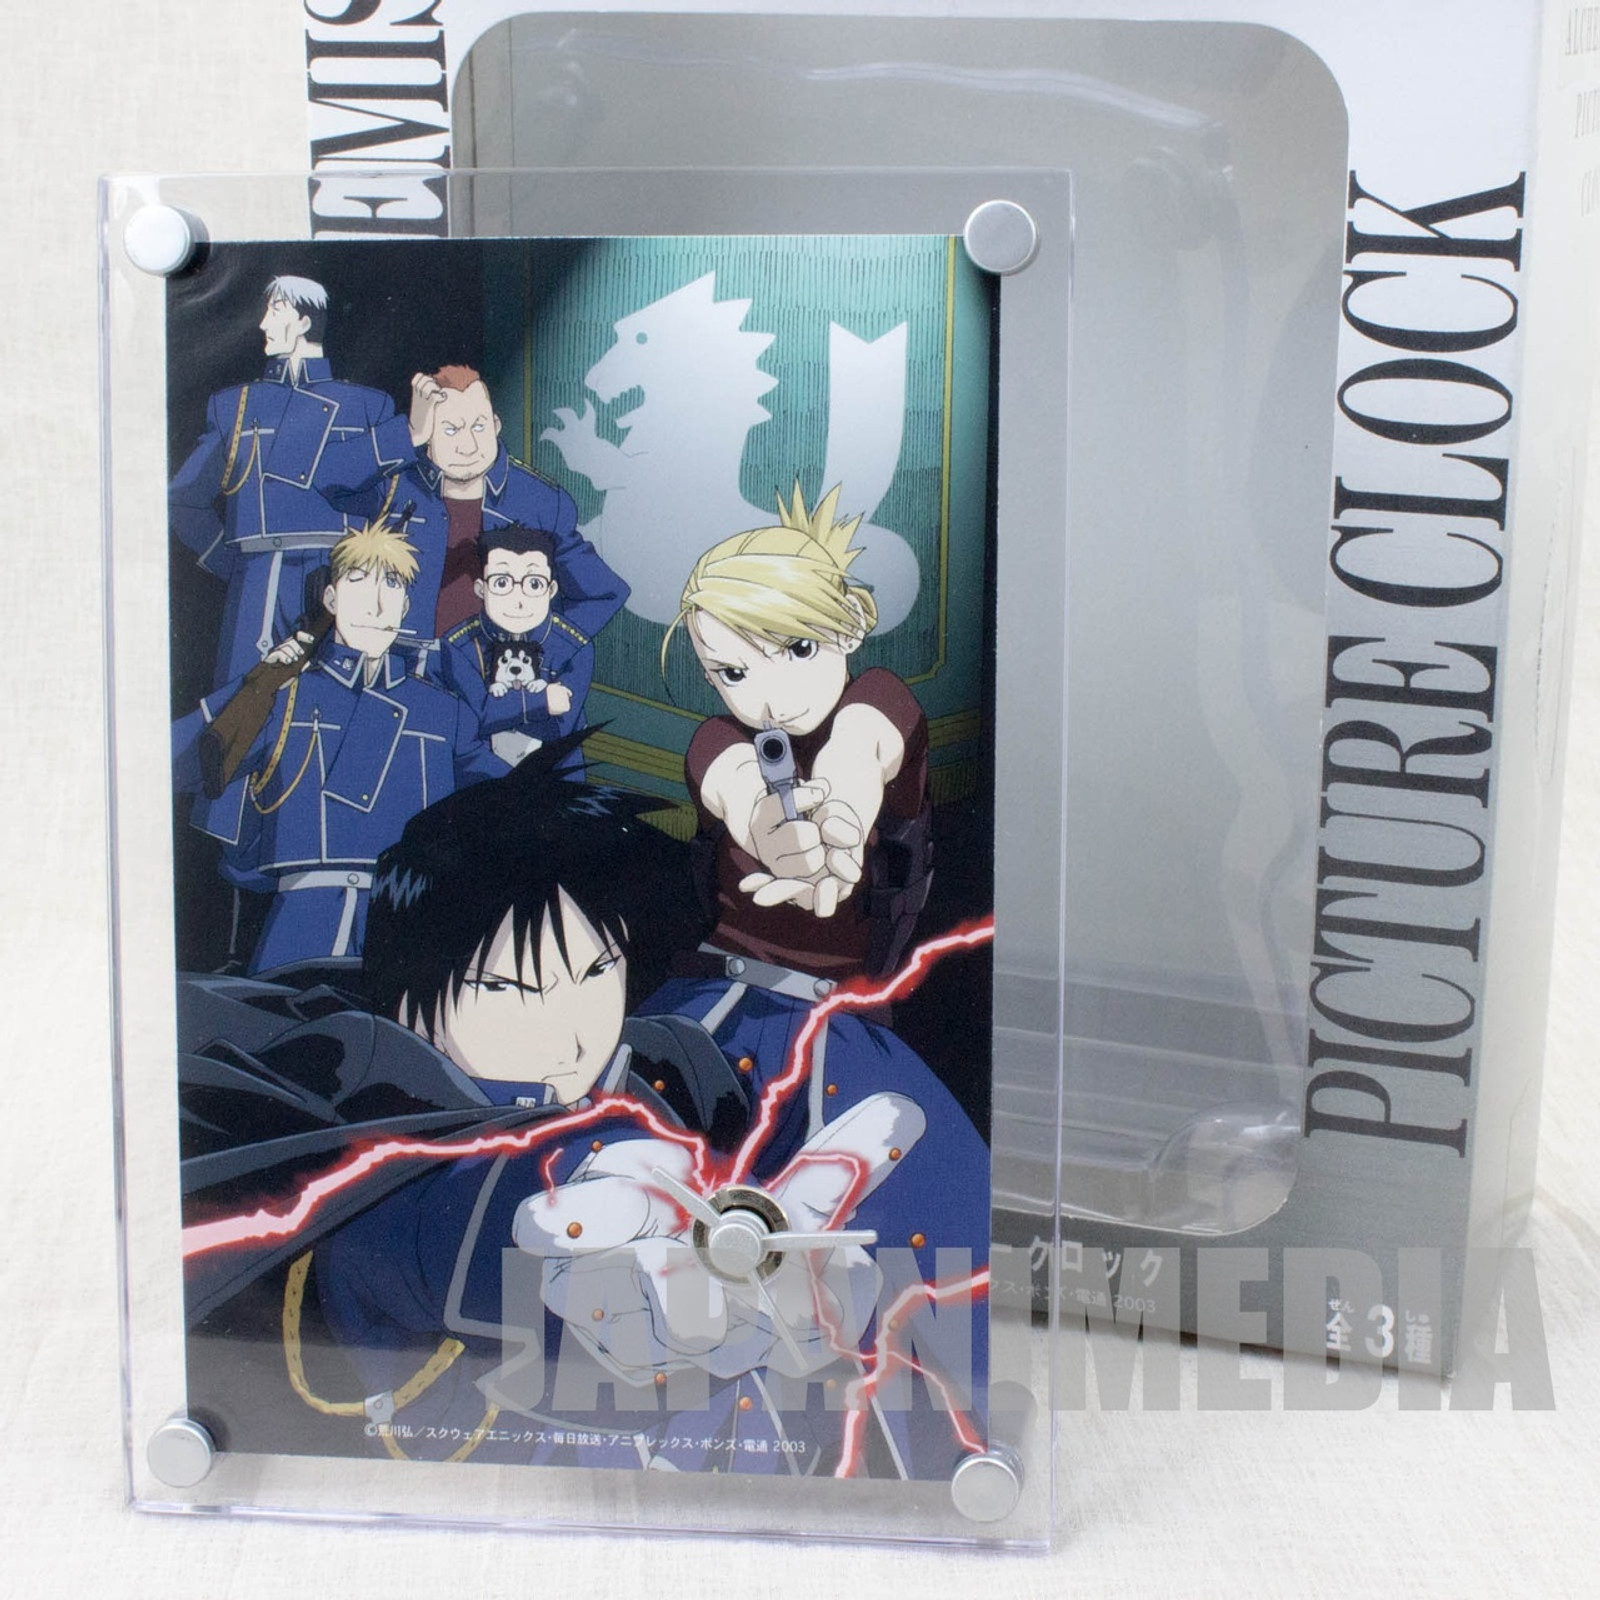 Fullmetal Alchemist Mustang & Riza Picture Desktop Clock JAPAN ANIME MANGA